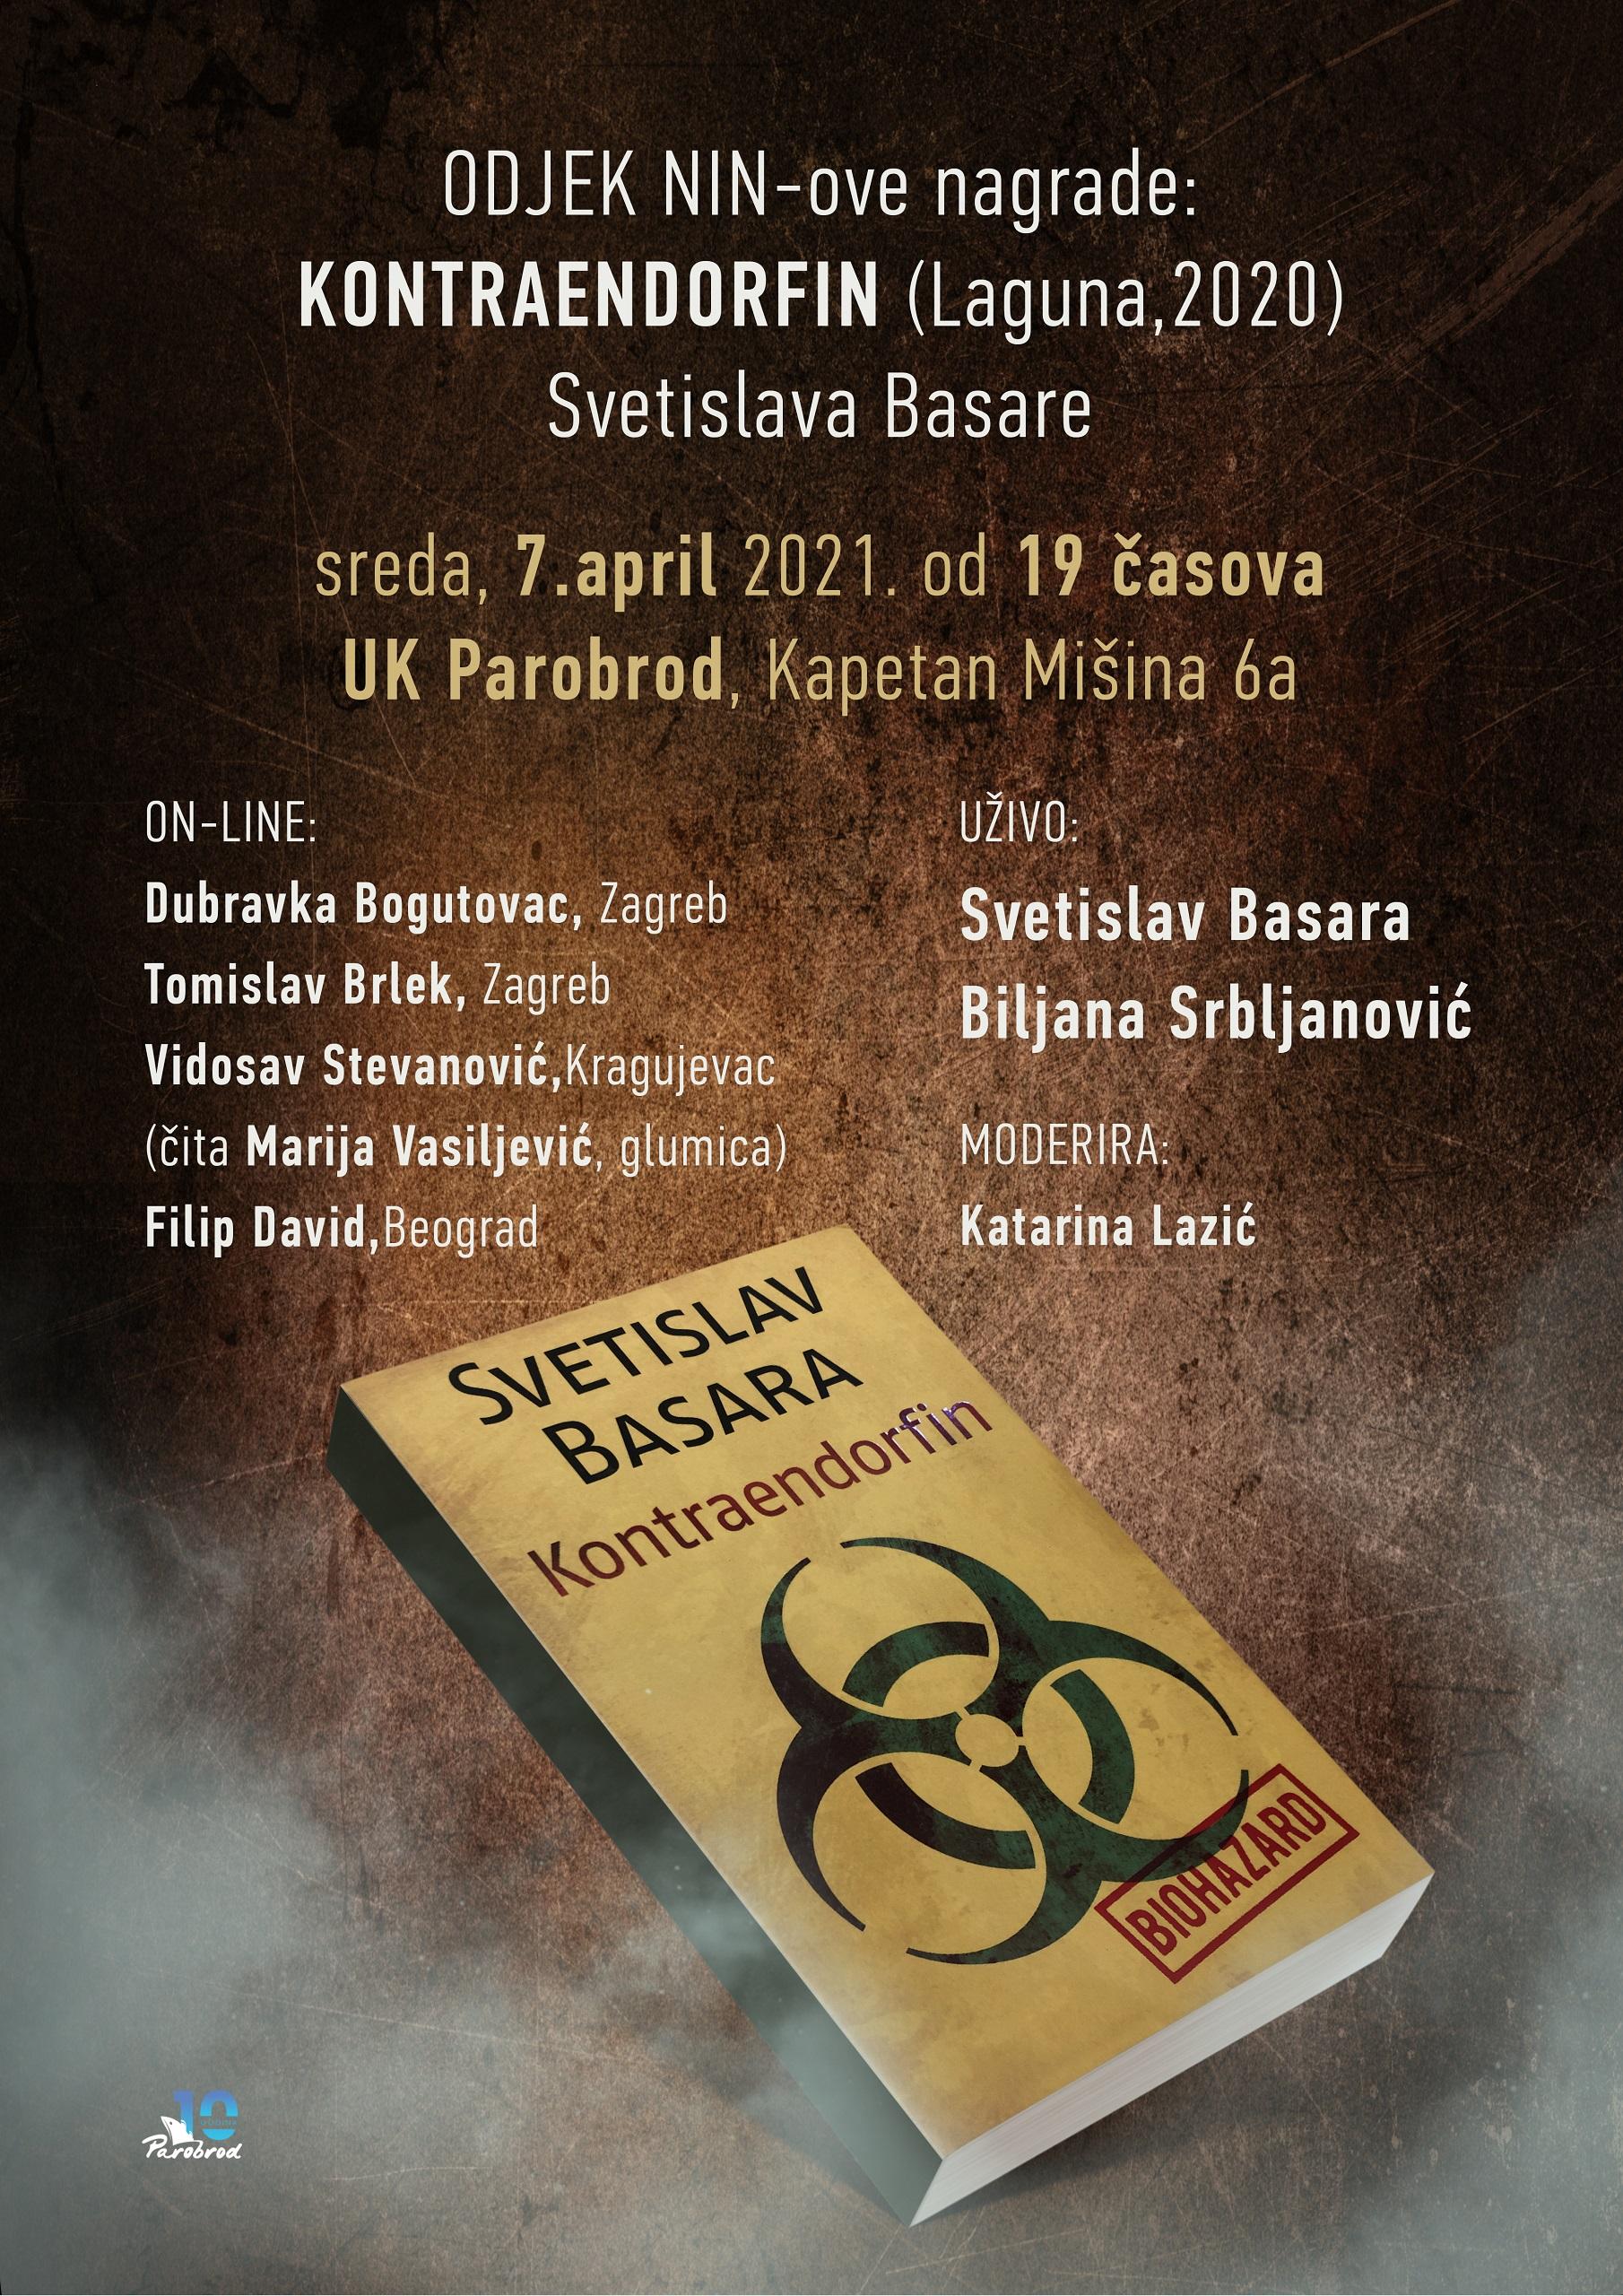 Odjek NIN-ove nagrade: KONTRAENDORFIN Svetislava Basare